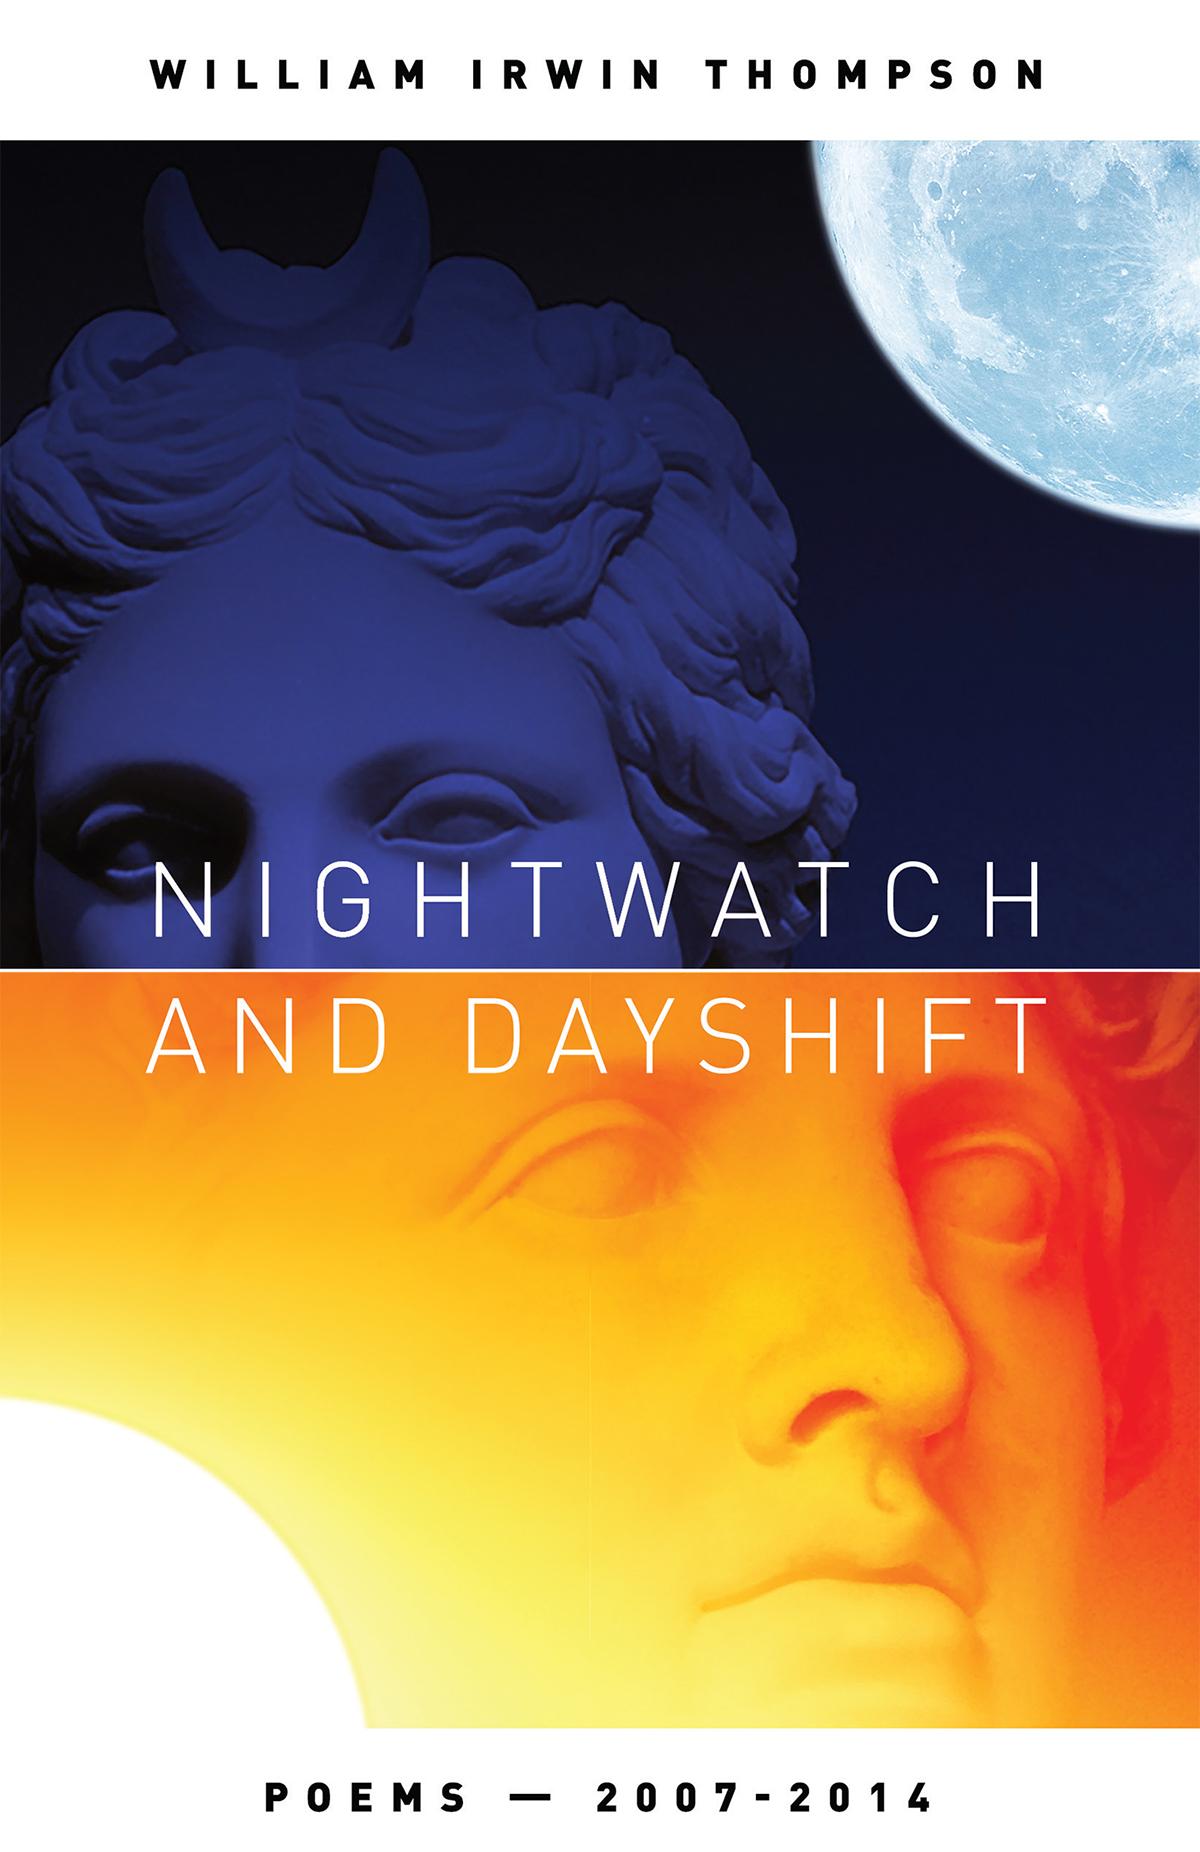 Nightwatch and Dayshift by William Irwin Thompson